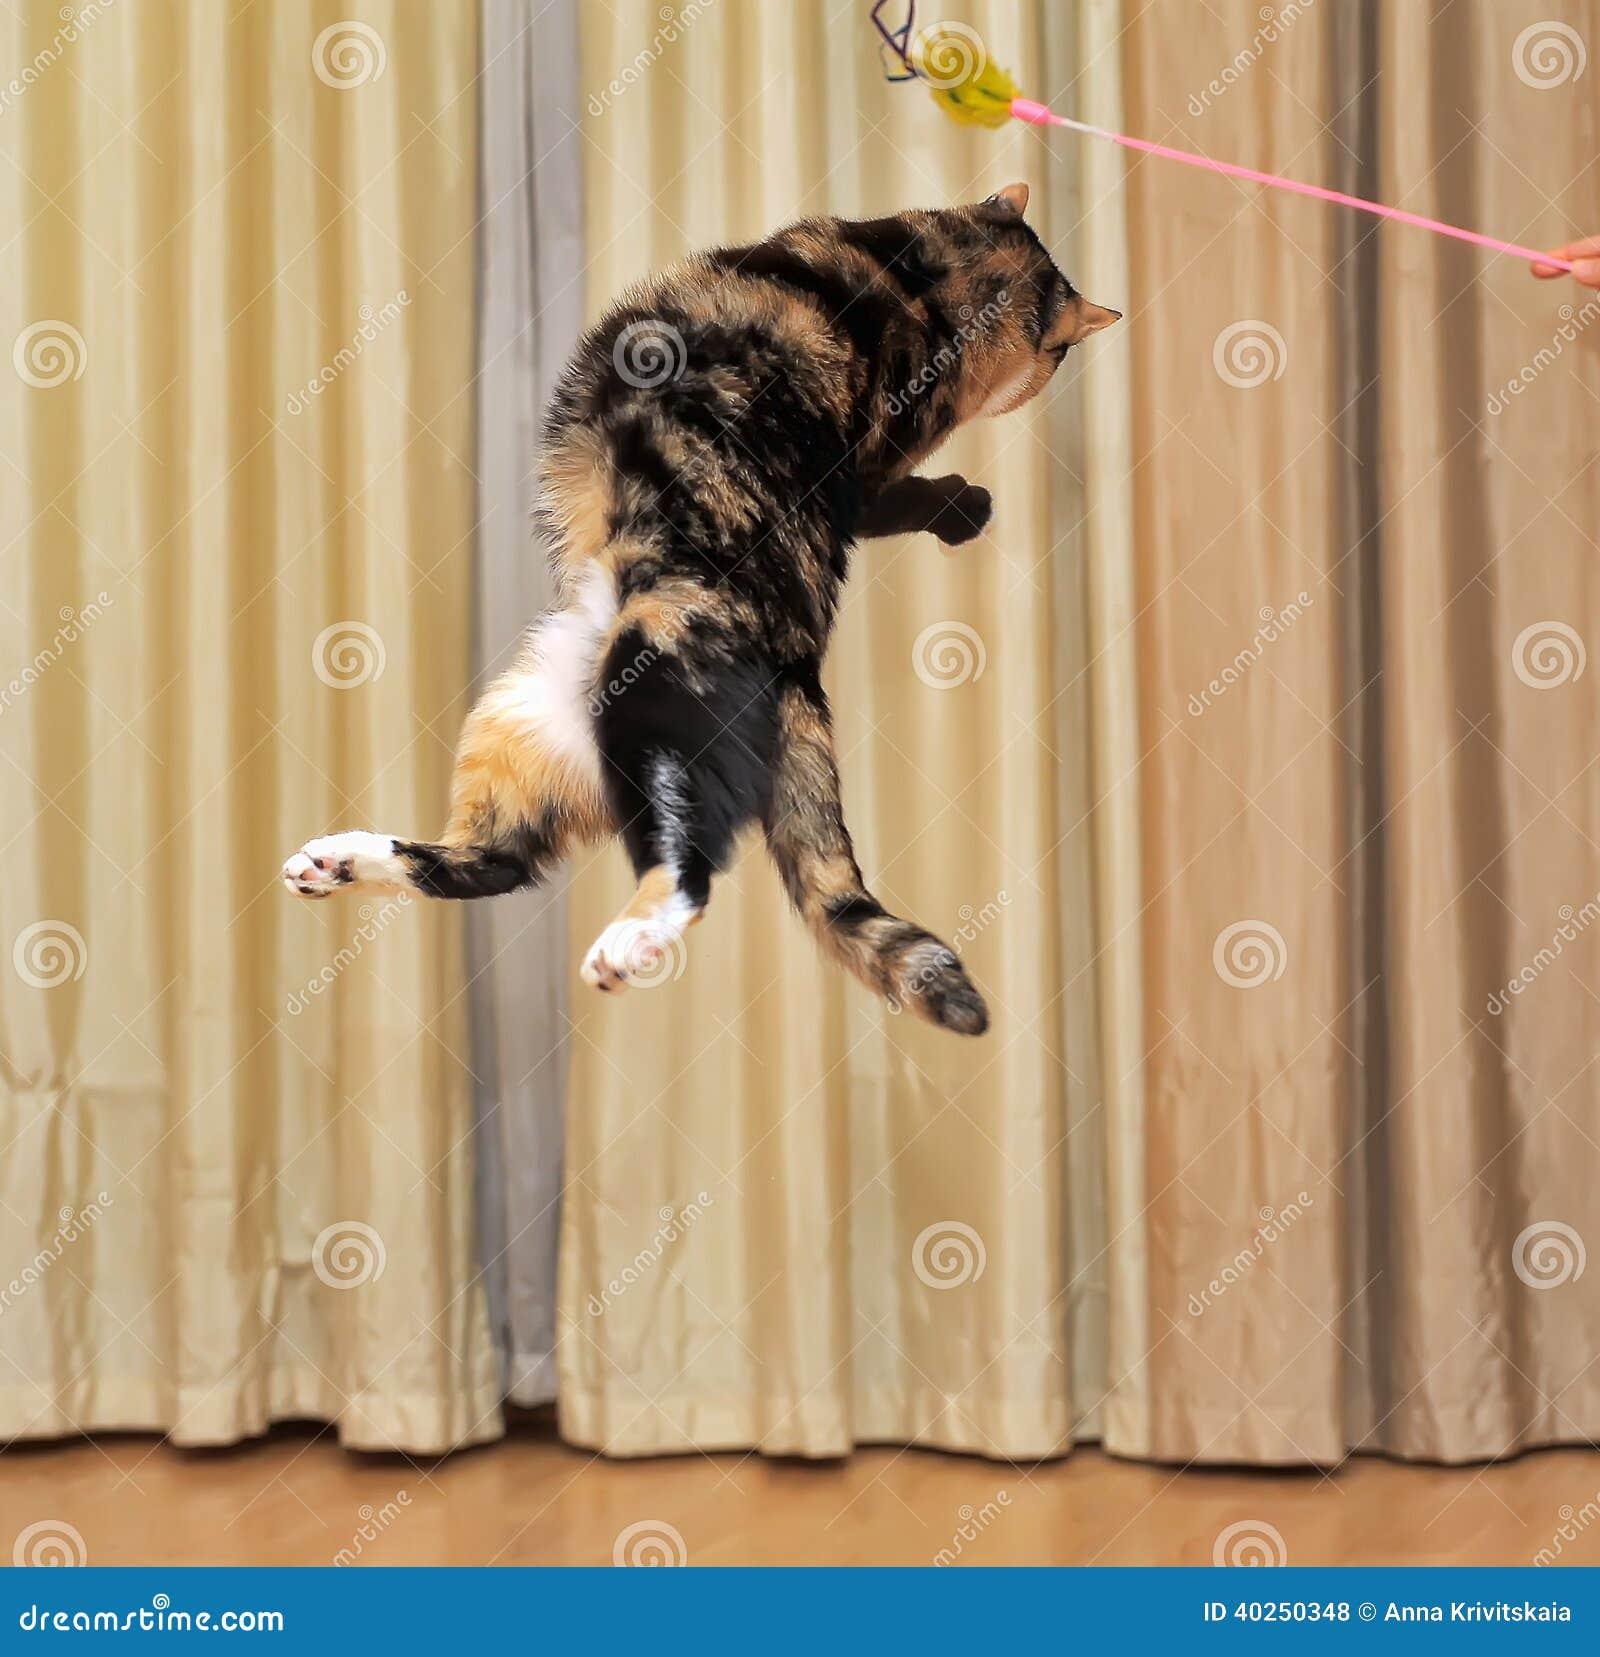 effective flea treatment for cats